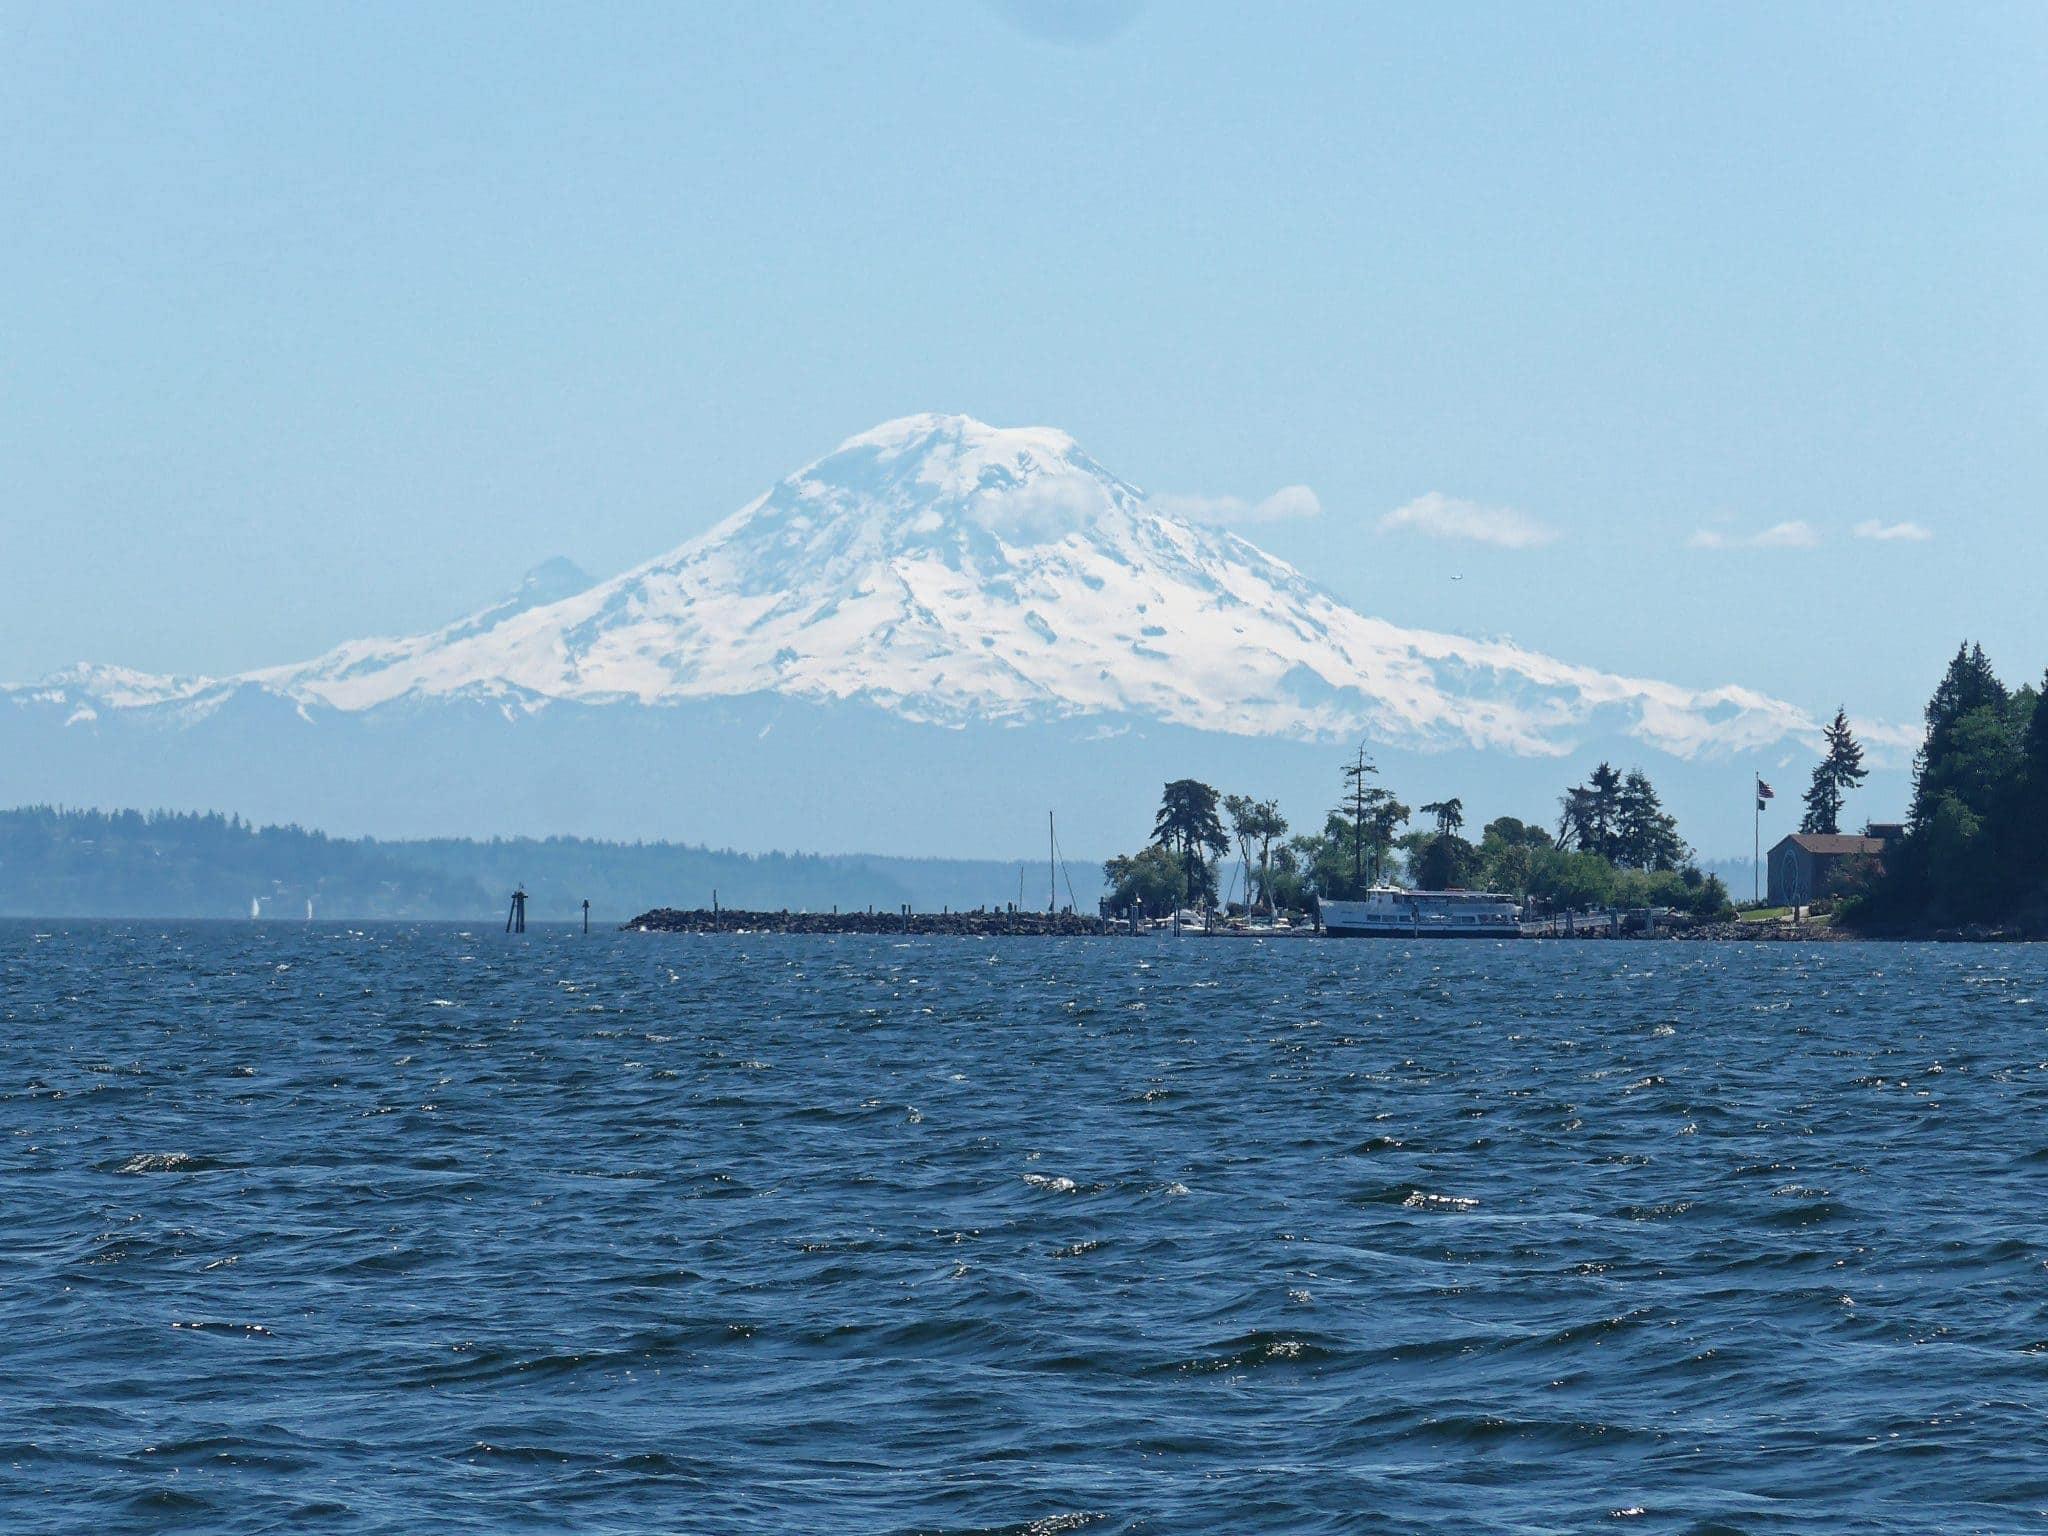 Blake Island with Argosy boat and Mt. Rainier